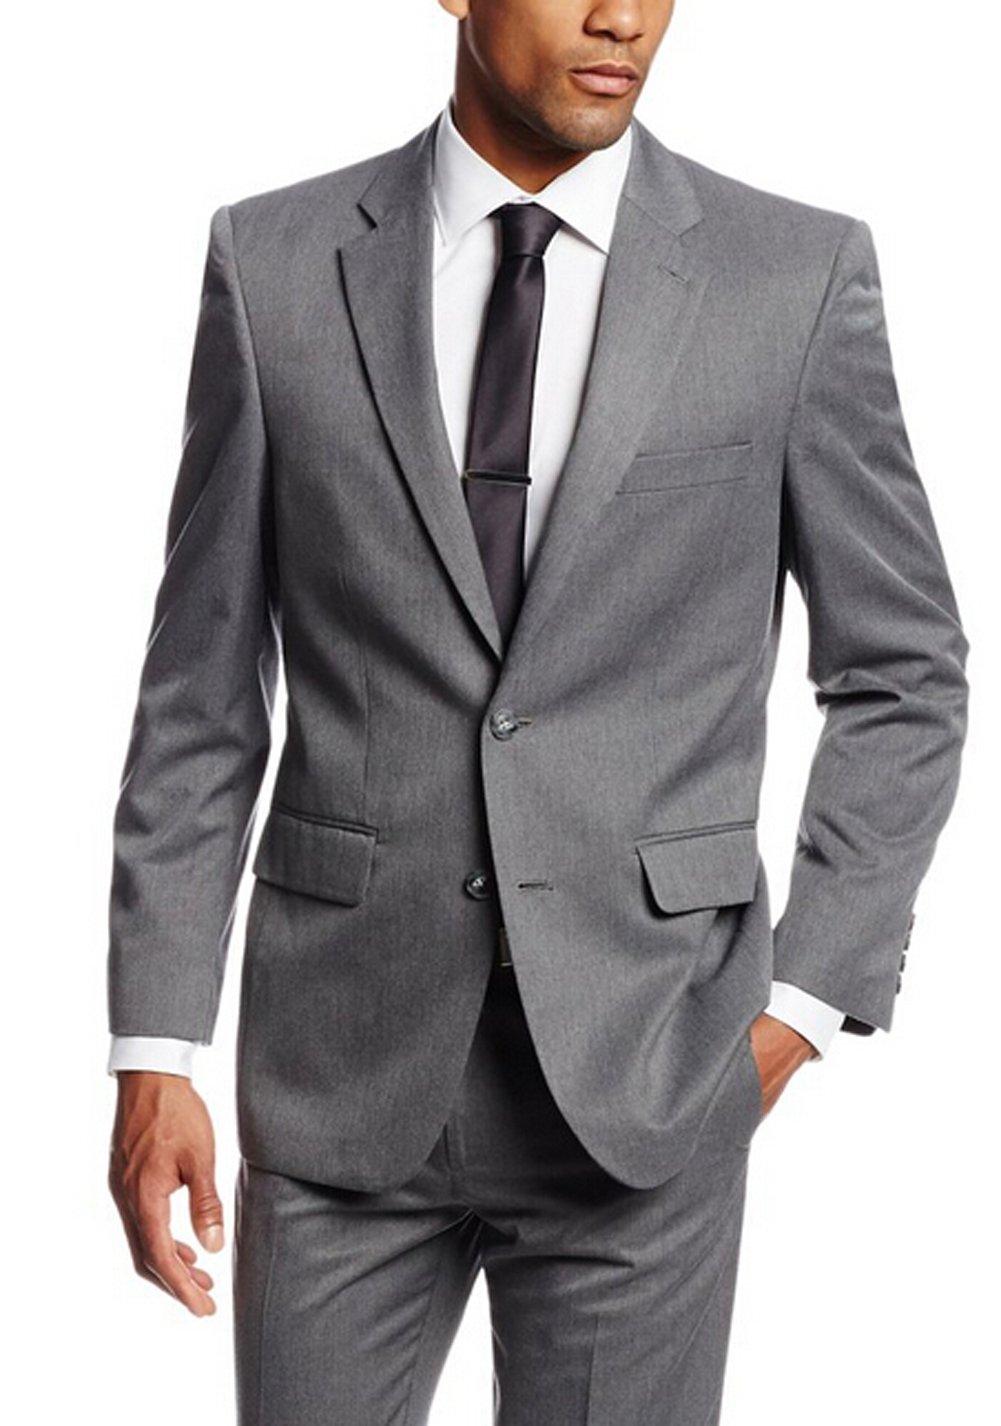 Love Dress Men's Gabardine Tailored-Fit Two-Button Side Vent Suit Jacke Pant 5XL